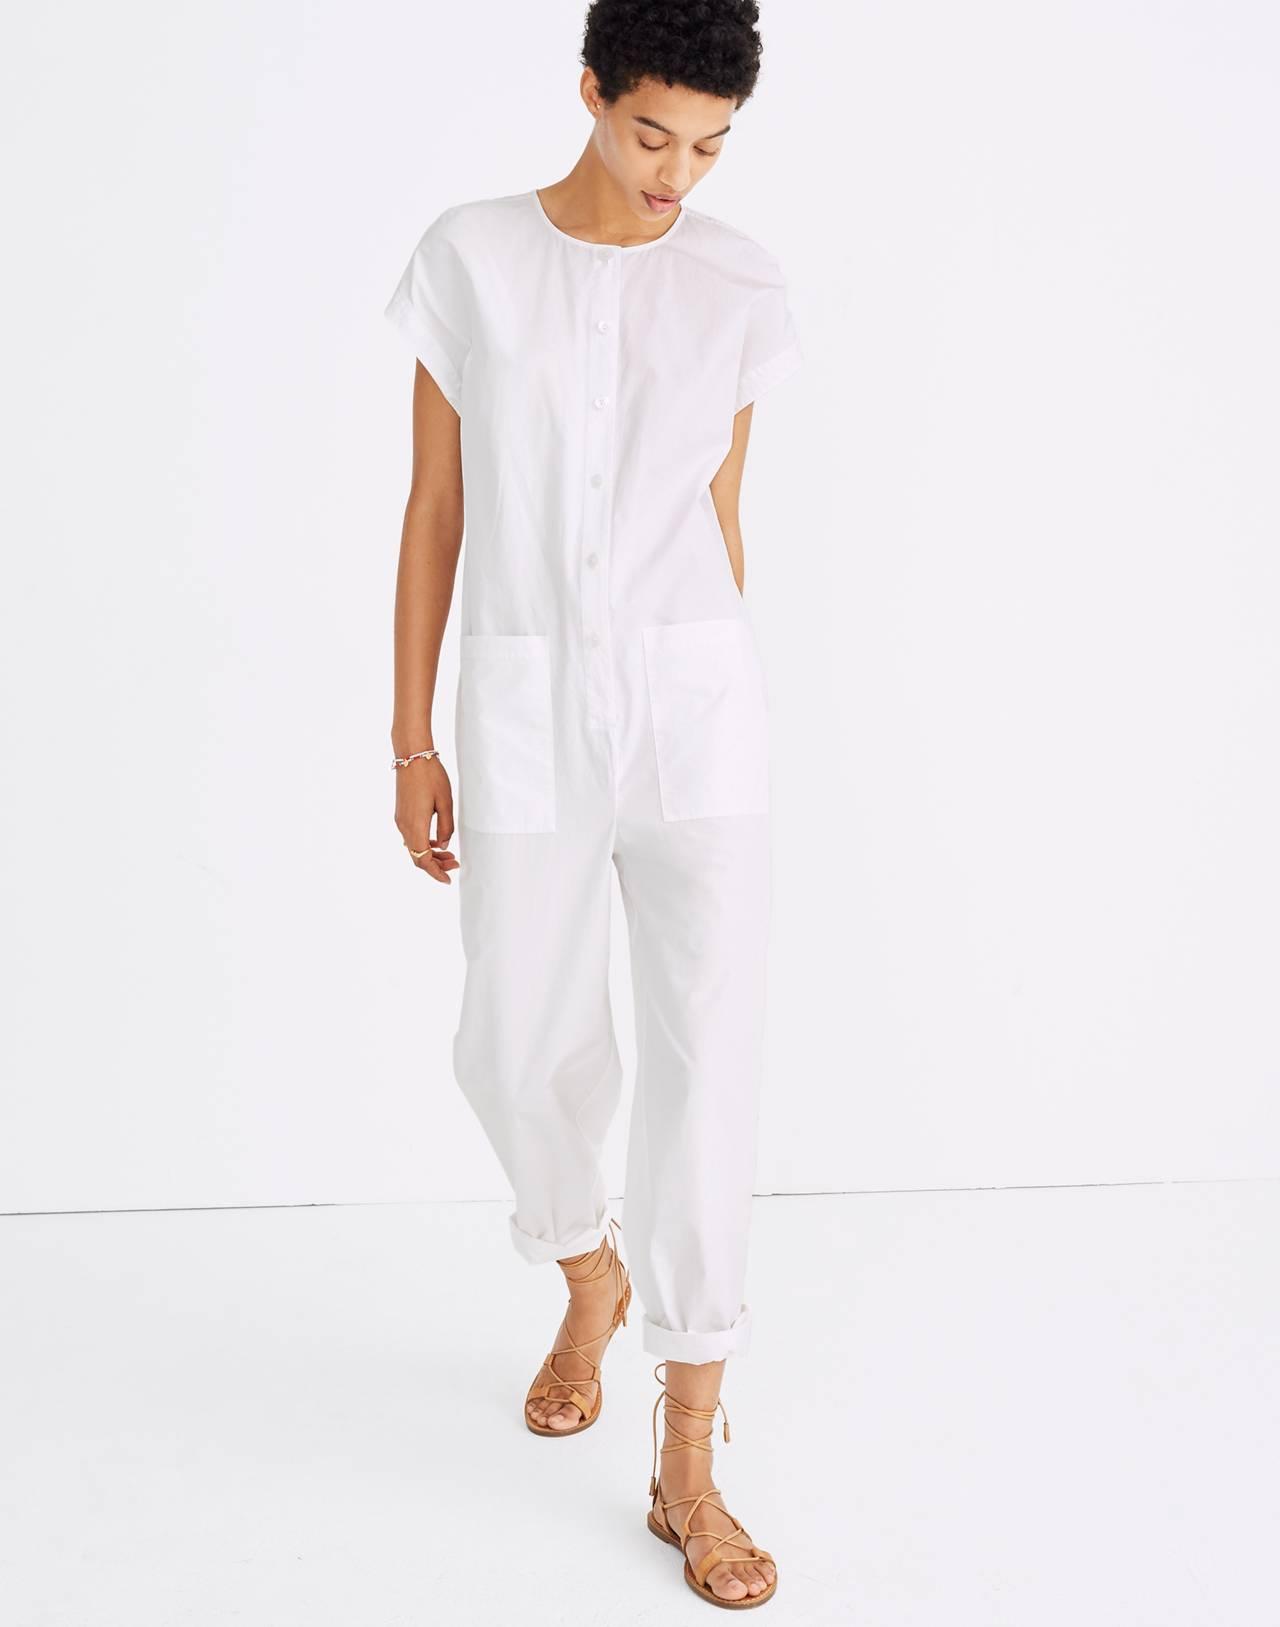 Mosswood Jumpsuit in eyelet white image 1